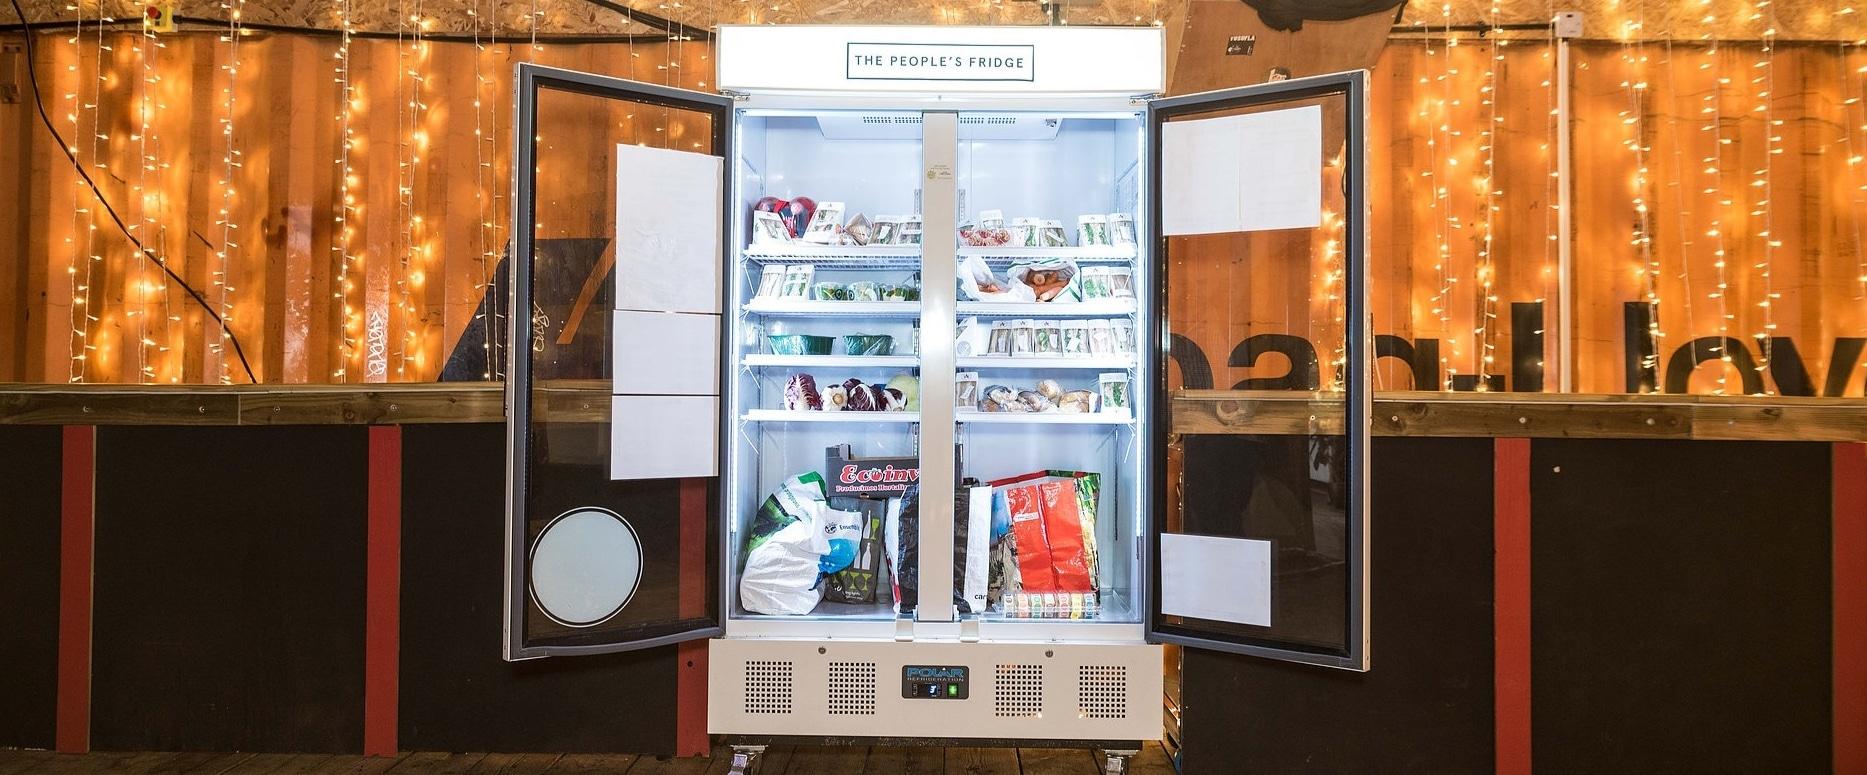 The People's Fridge ตู้เย็นสาธารณะ เหลือเอามาแบ่ง อยากได้อะไรให้มาหยิบ